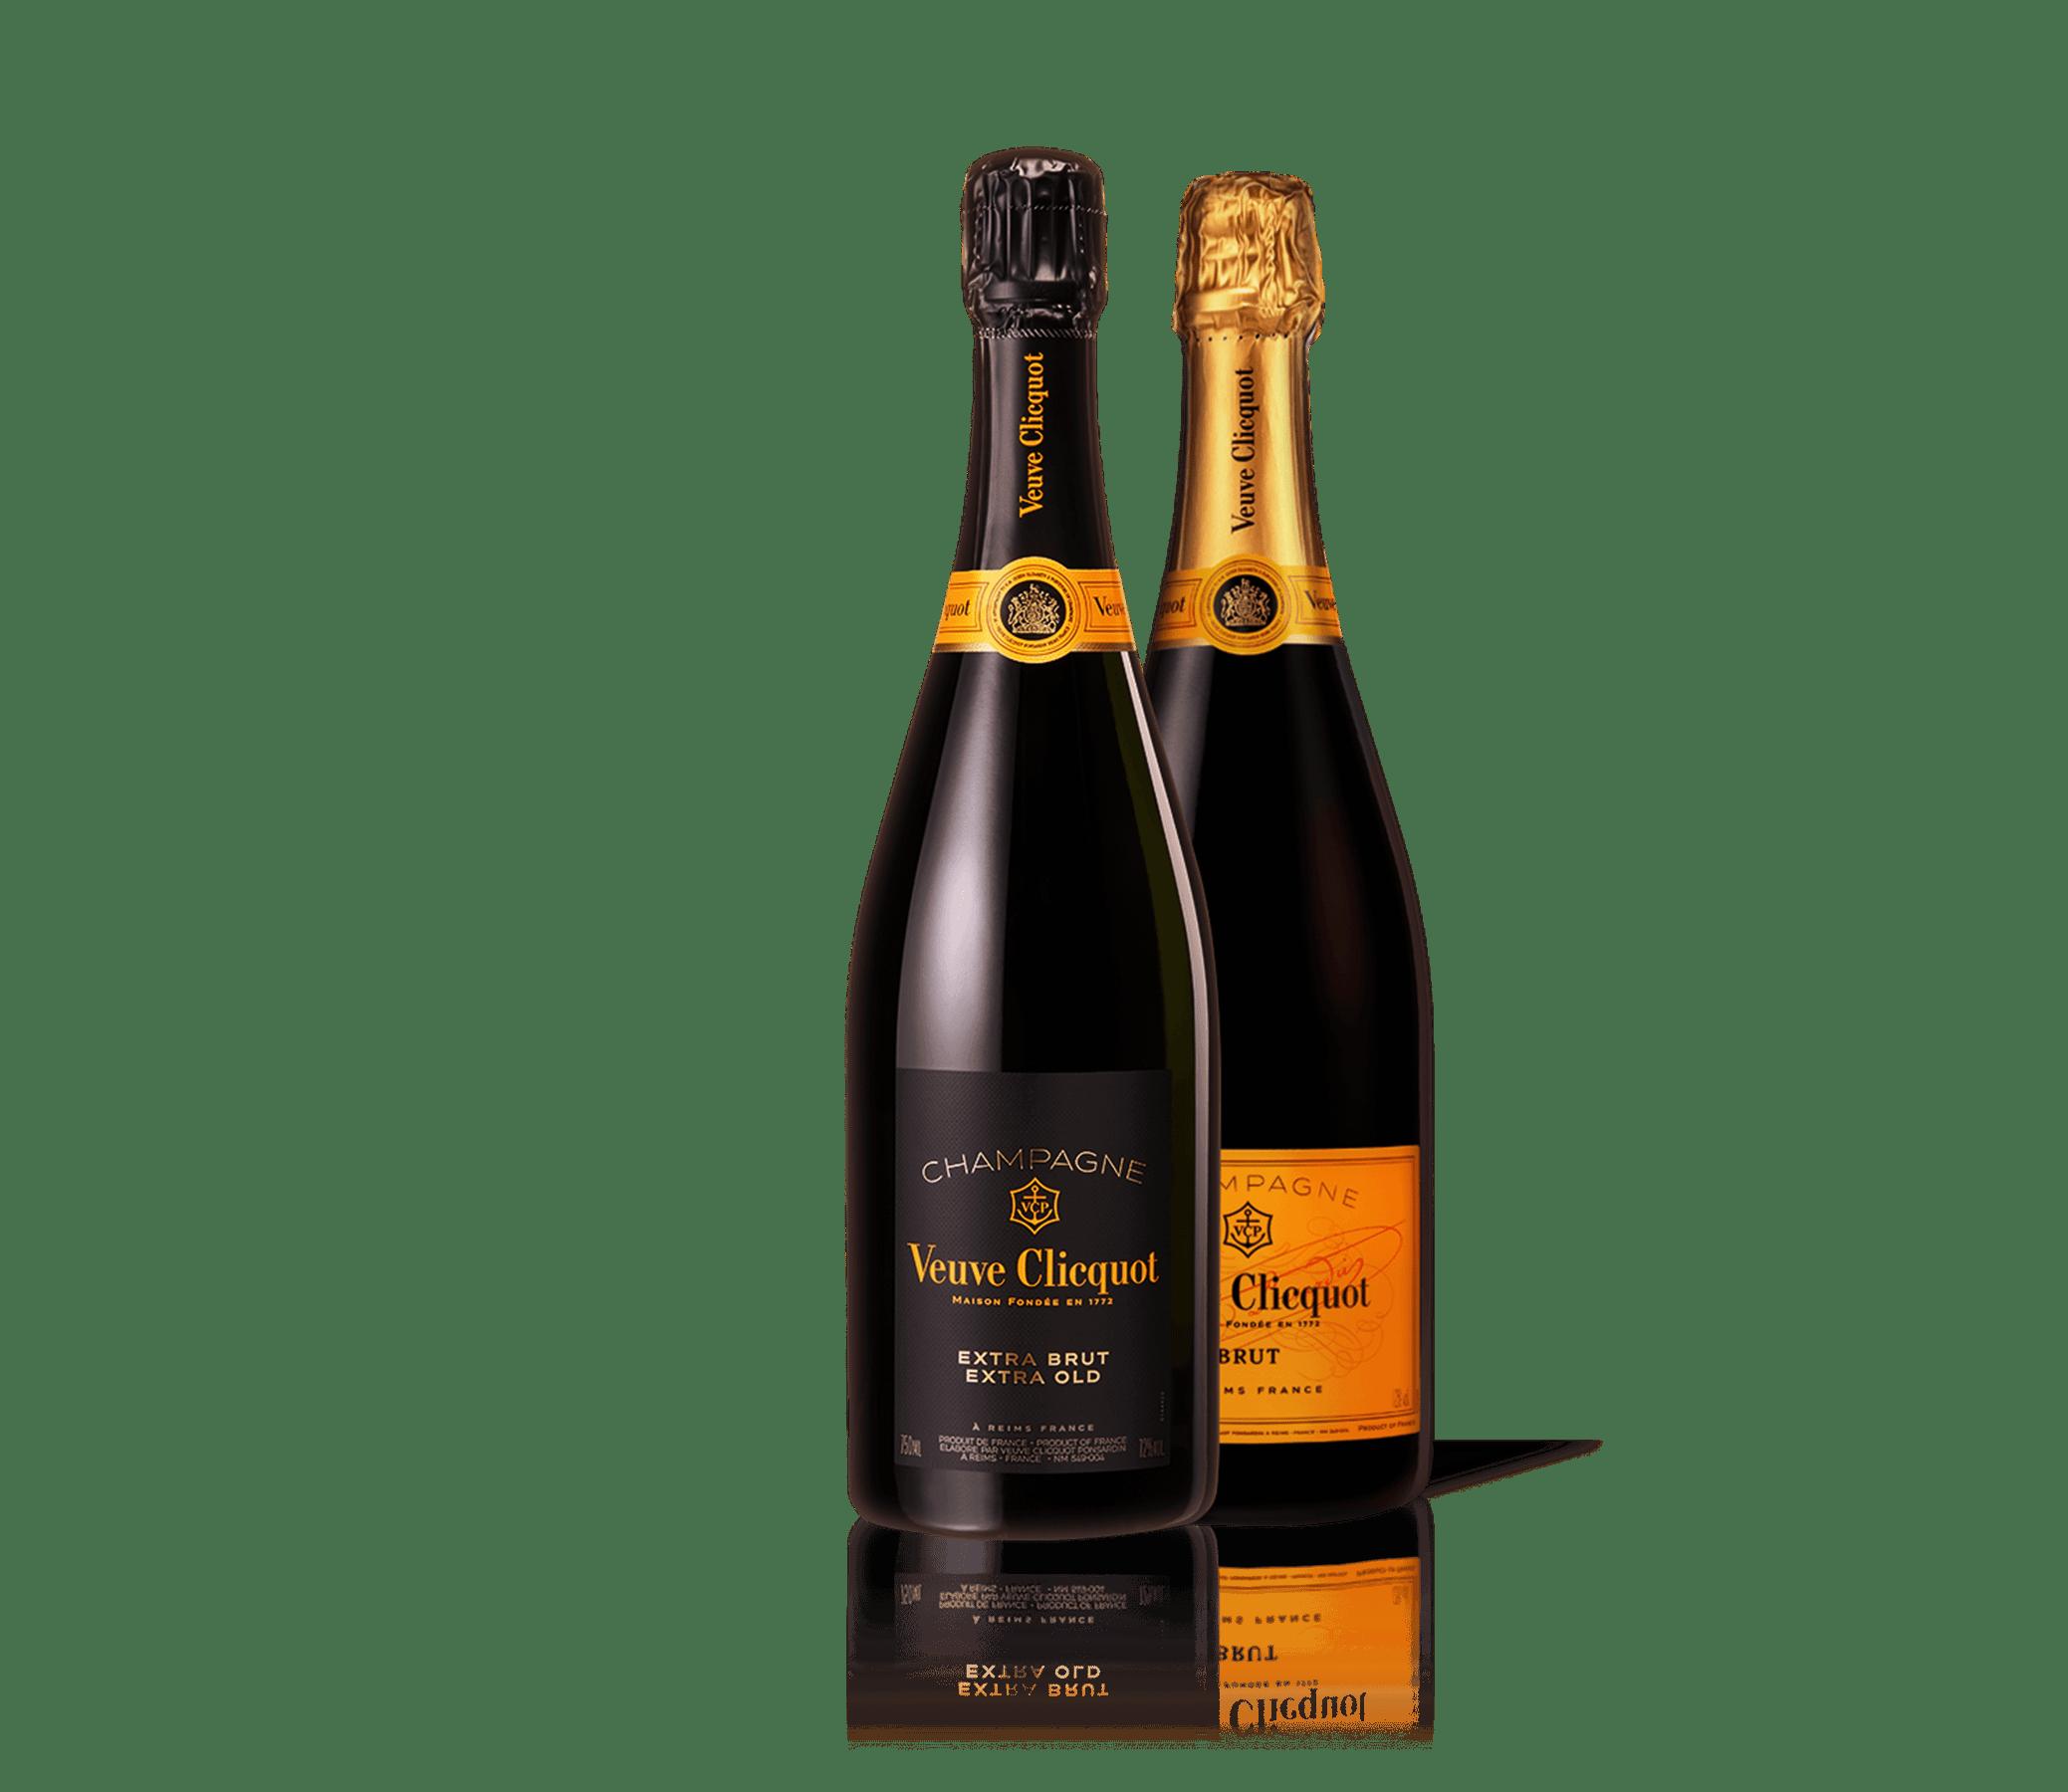 Бутылка шампанского Veuve Clicquot Extra Brut Extra Old 1